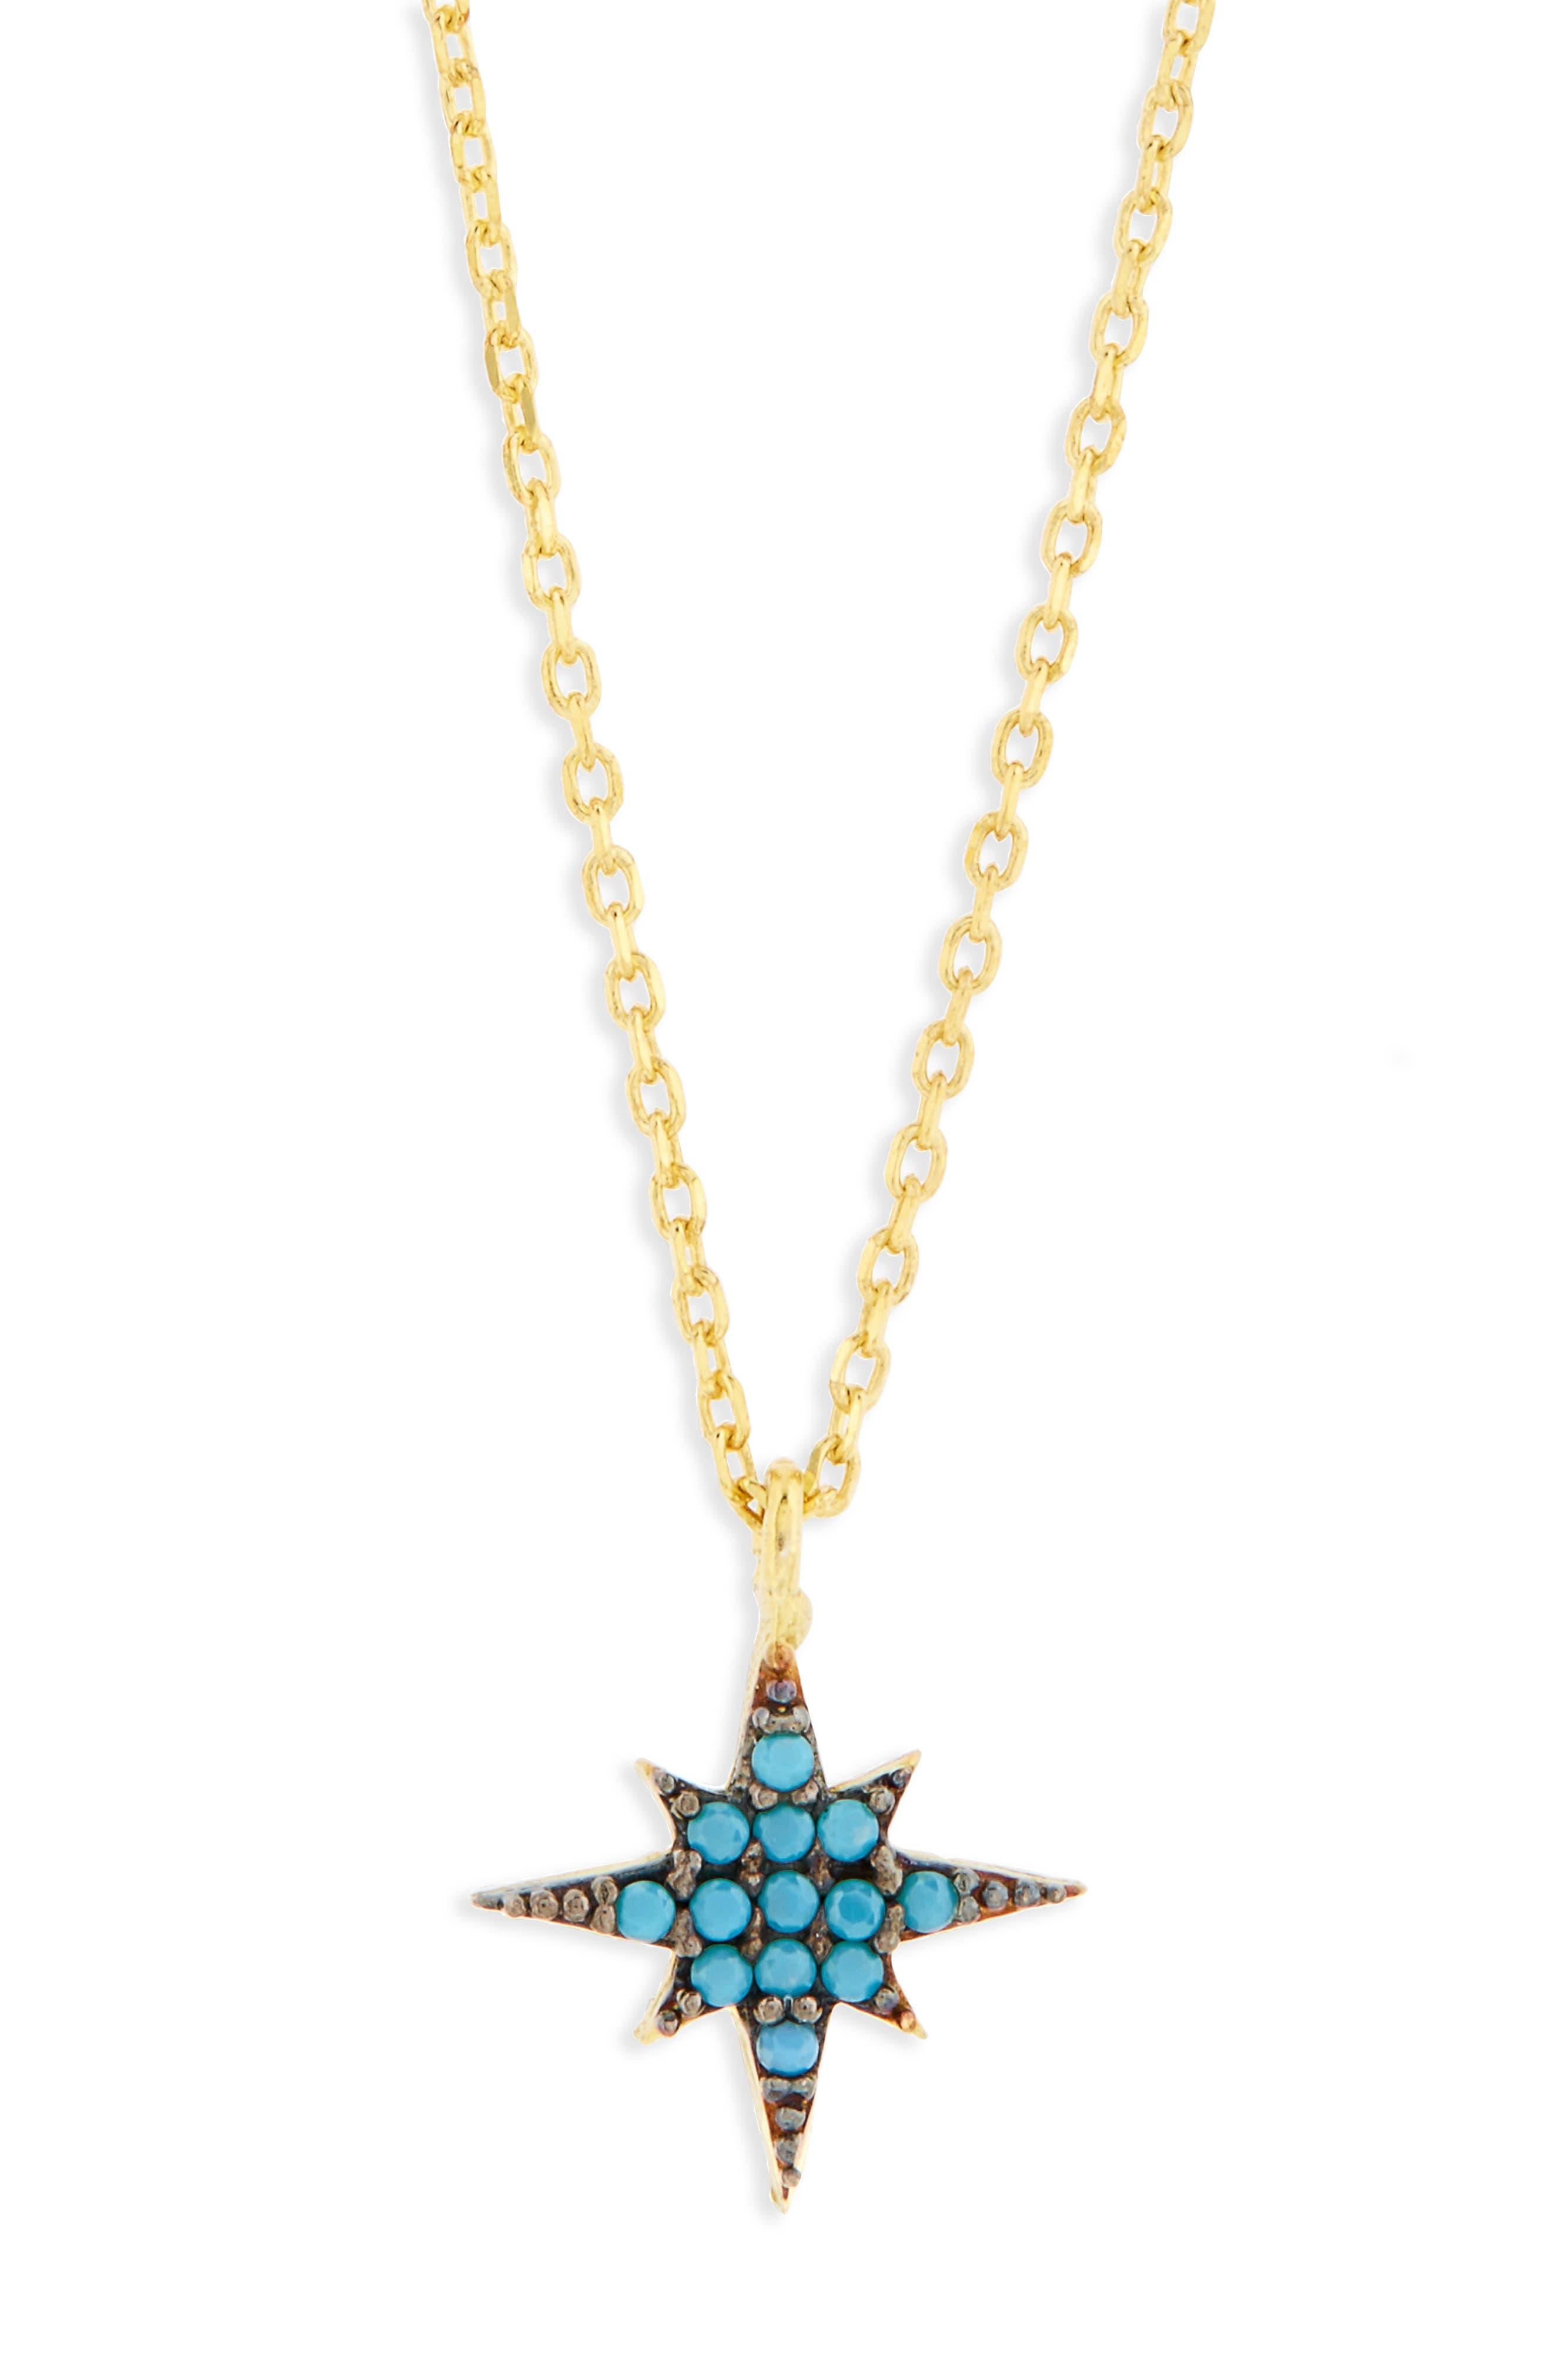 Karen London Blissful Pendant Necklace